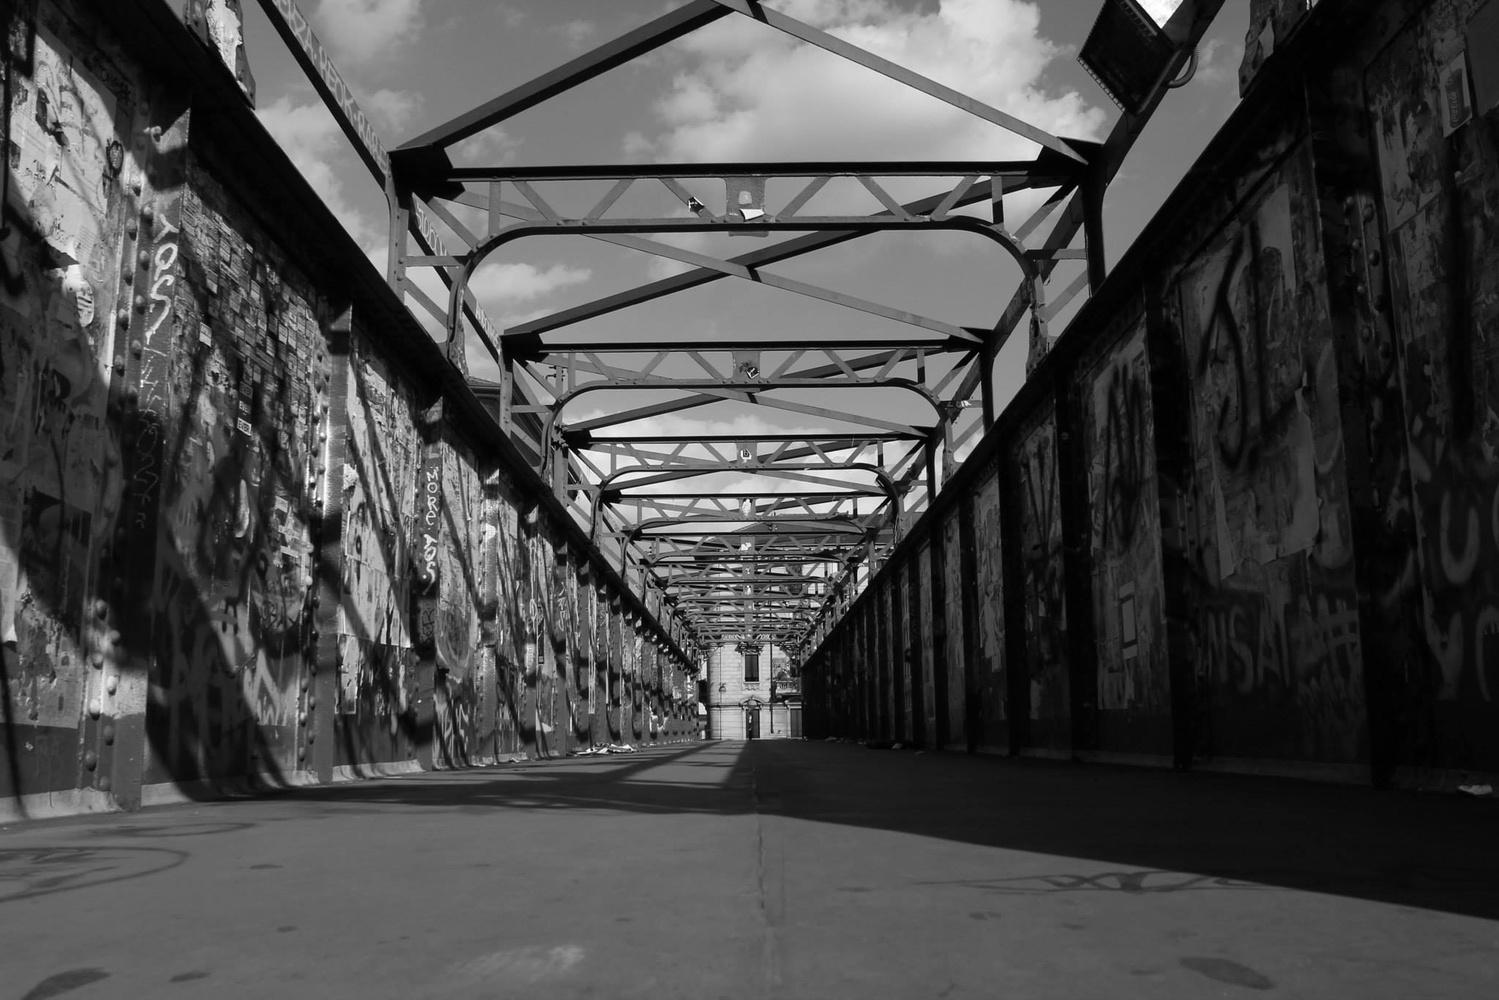 Industrial Steel by Cameron McGrath